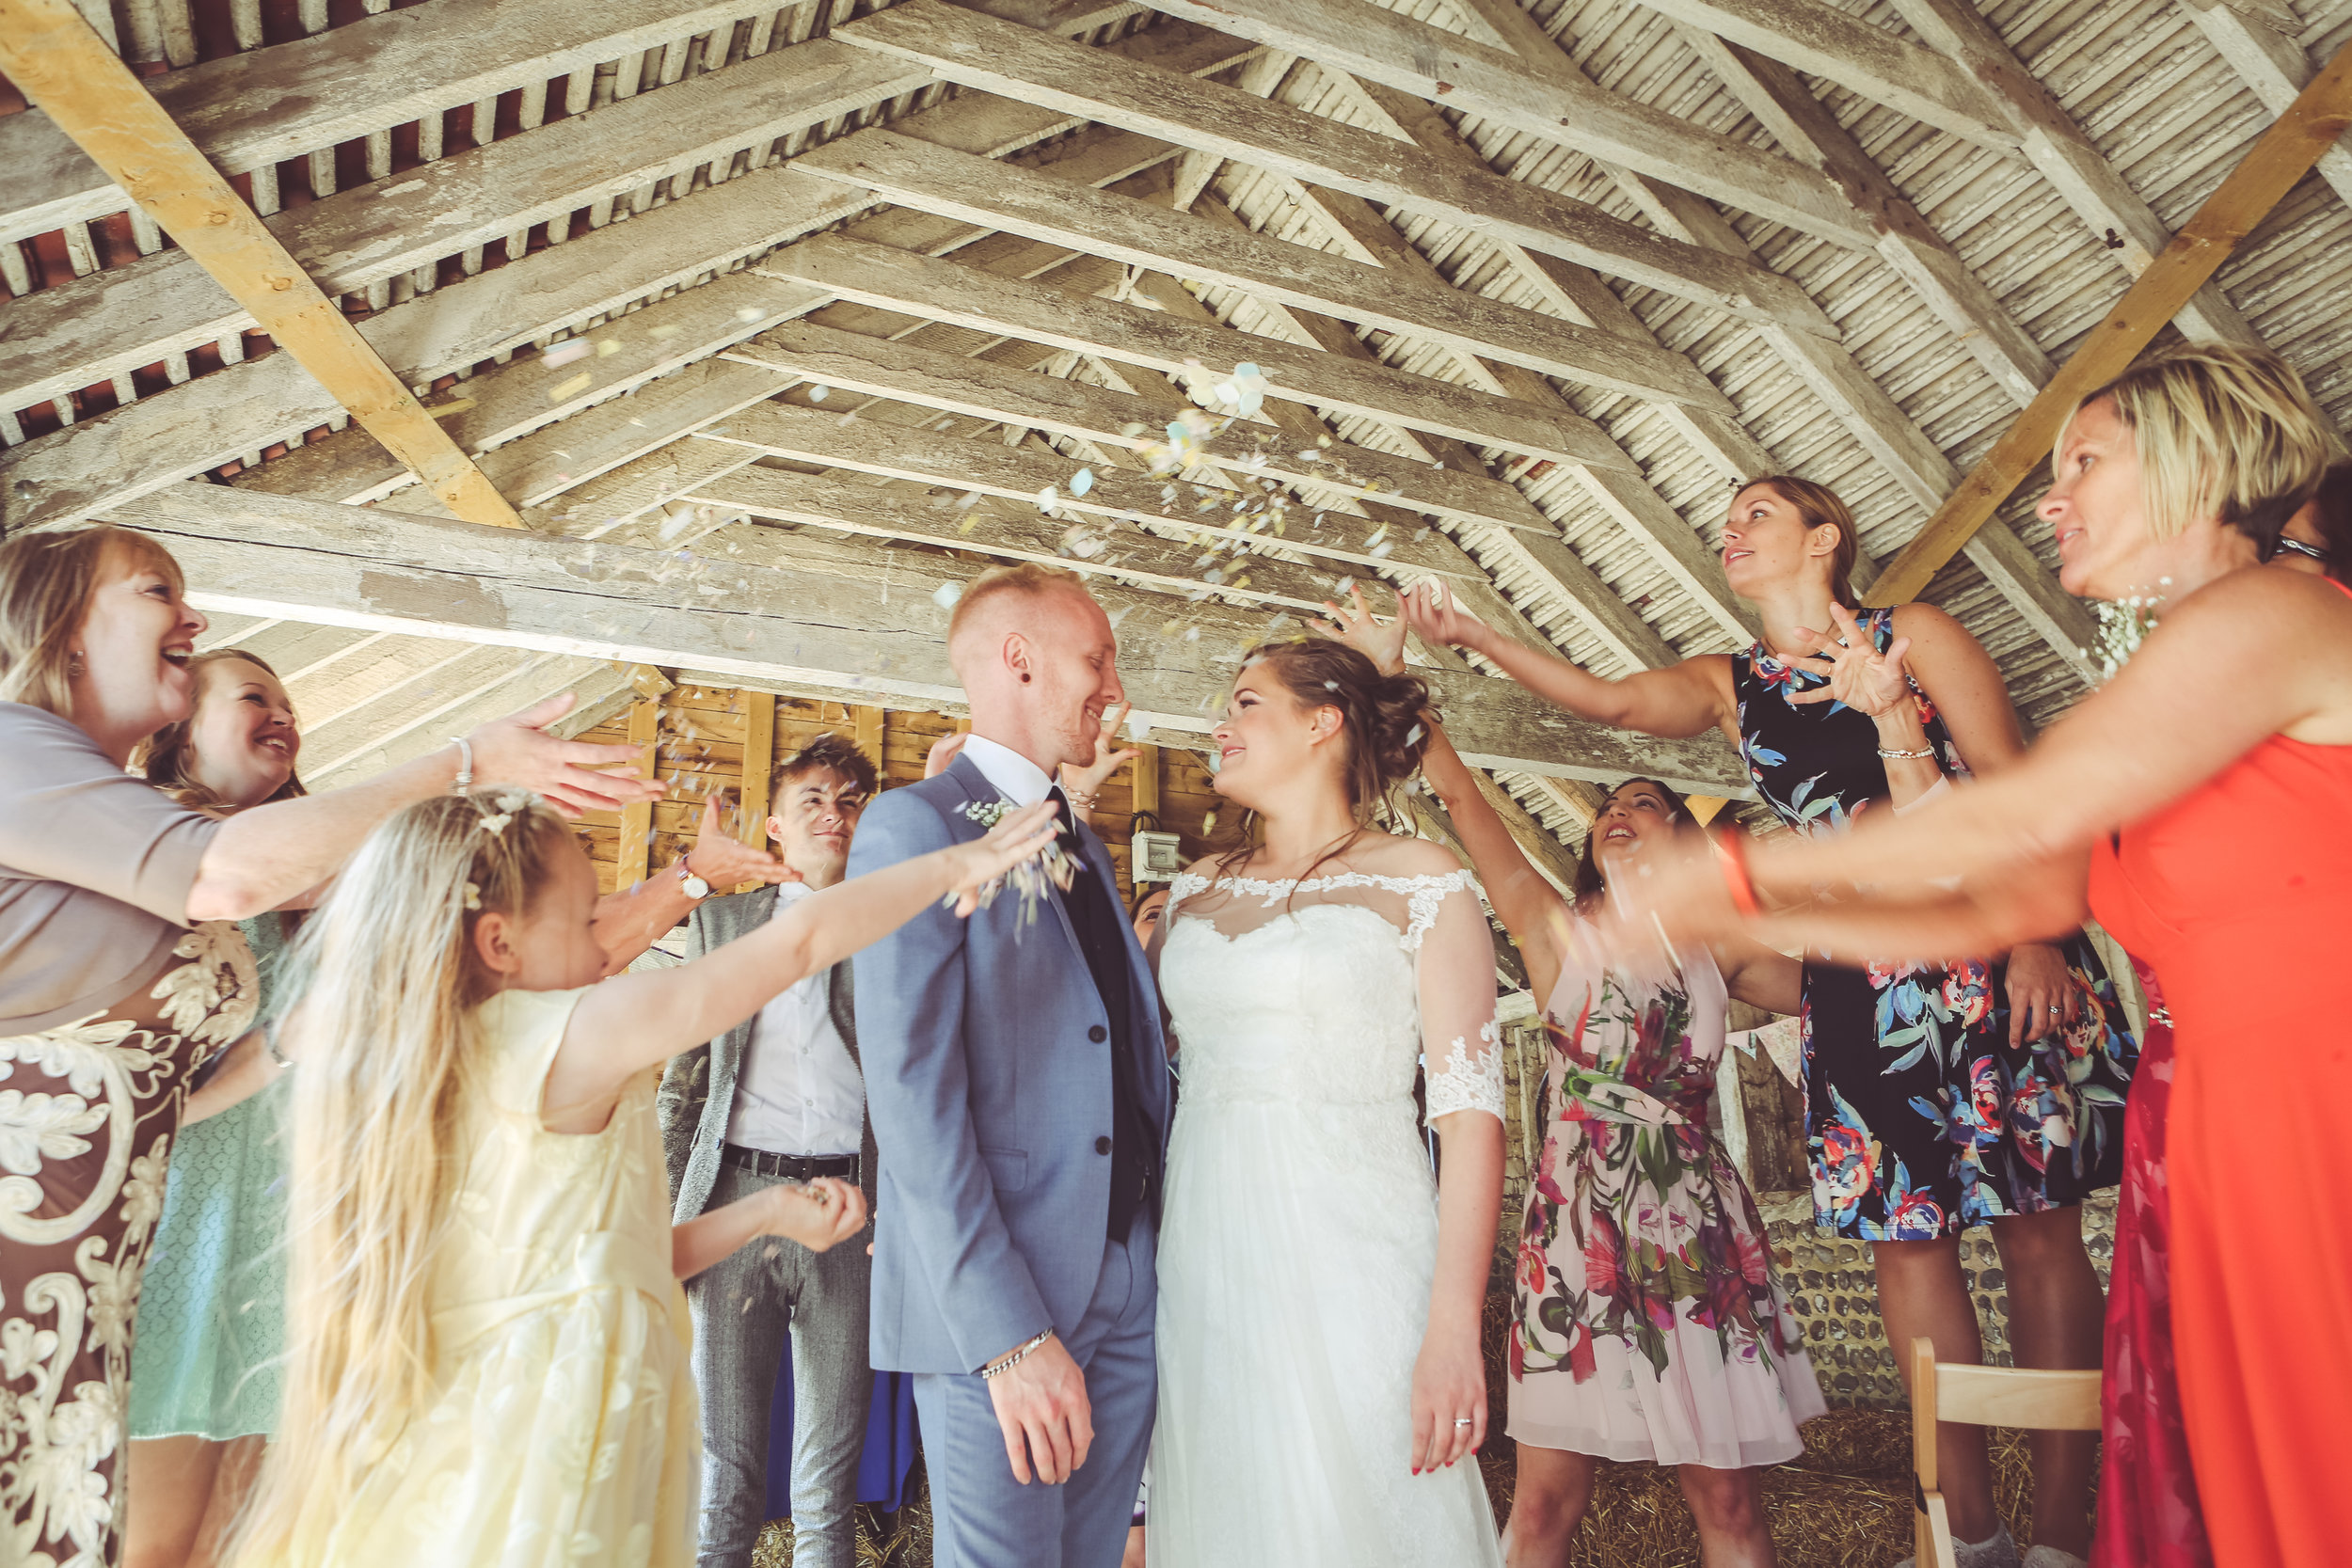 Amy & Adam Wedding - July 2nd 2016 Sussex BarnAmy & Adam Wedding - Sussex BarnFRNH2019.jpg